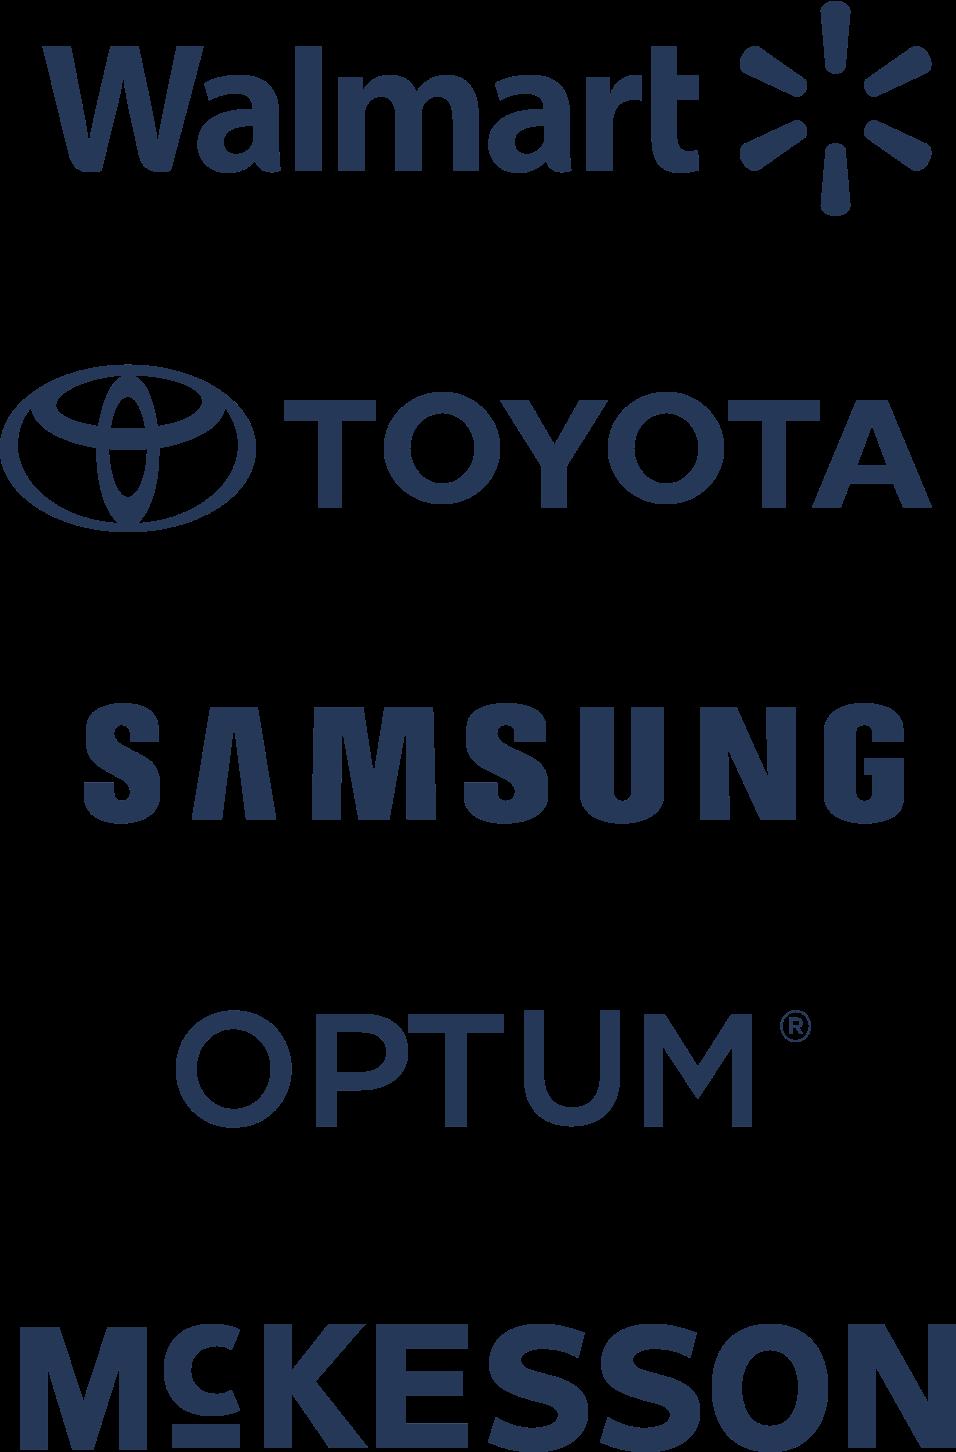 Walmart、Toyota、Samsung、Optum、McKesson のロゴ